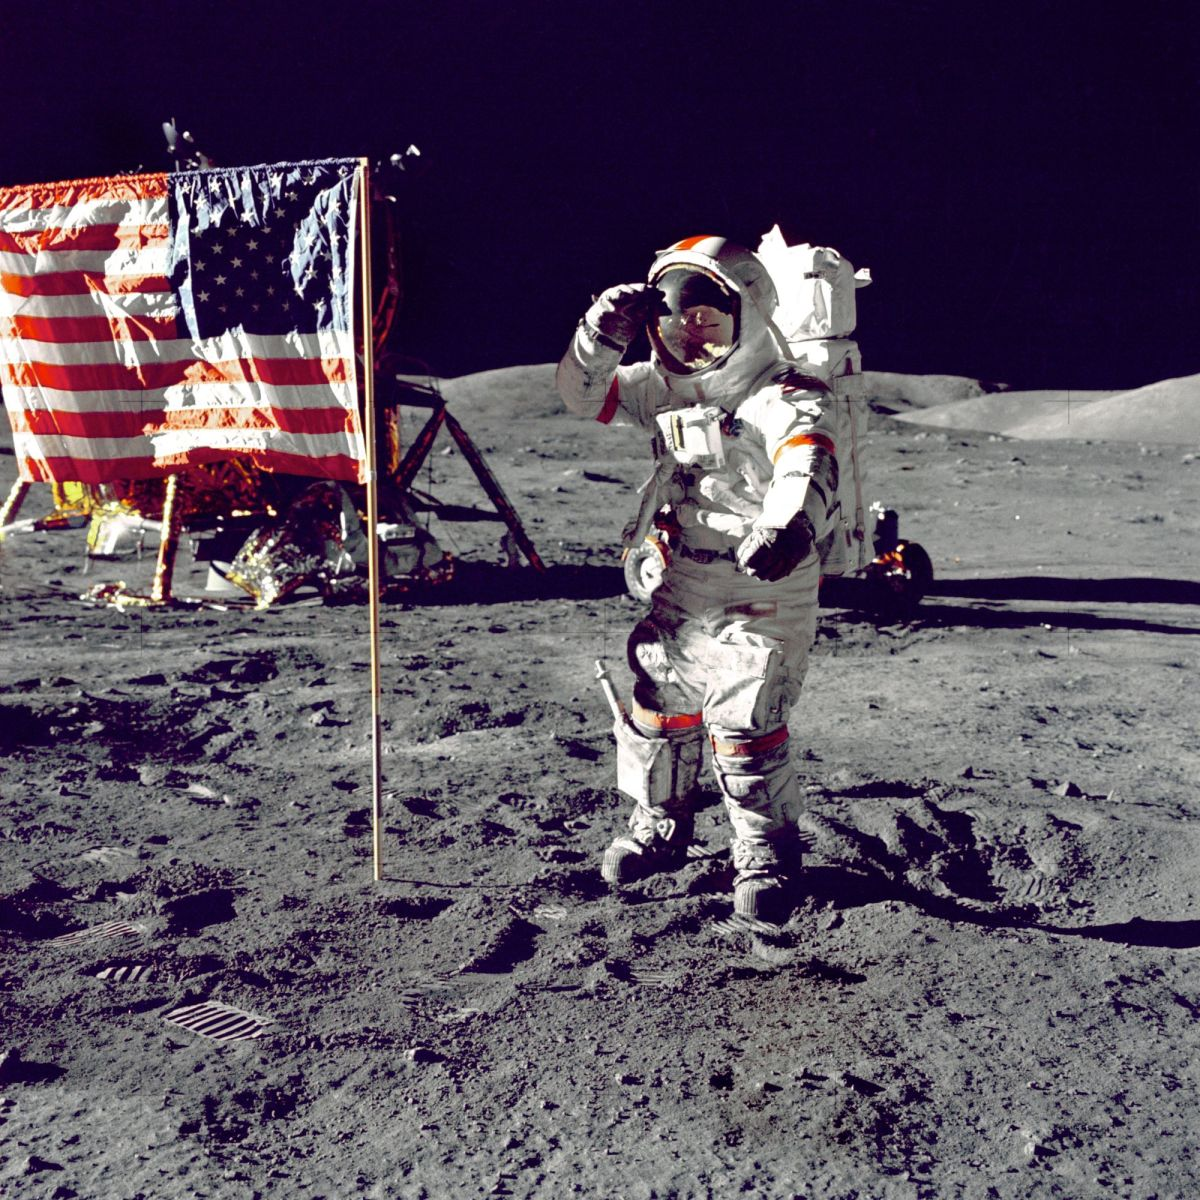 moon landing nasa-43979-unsplash